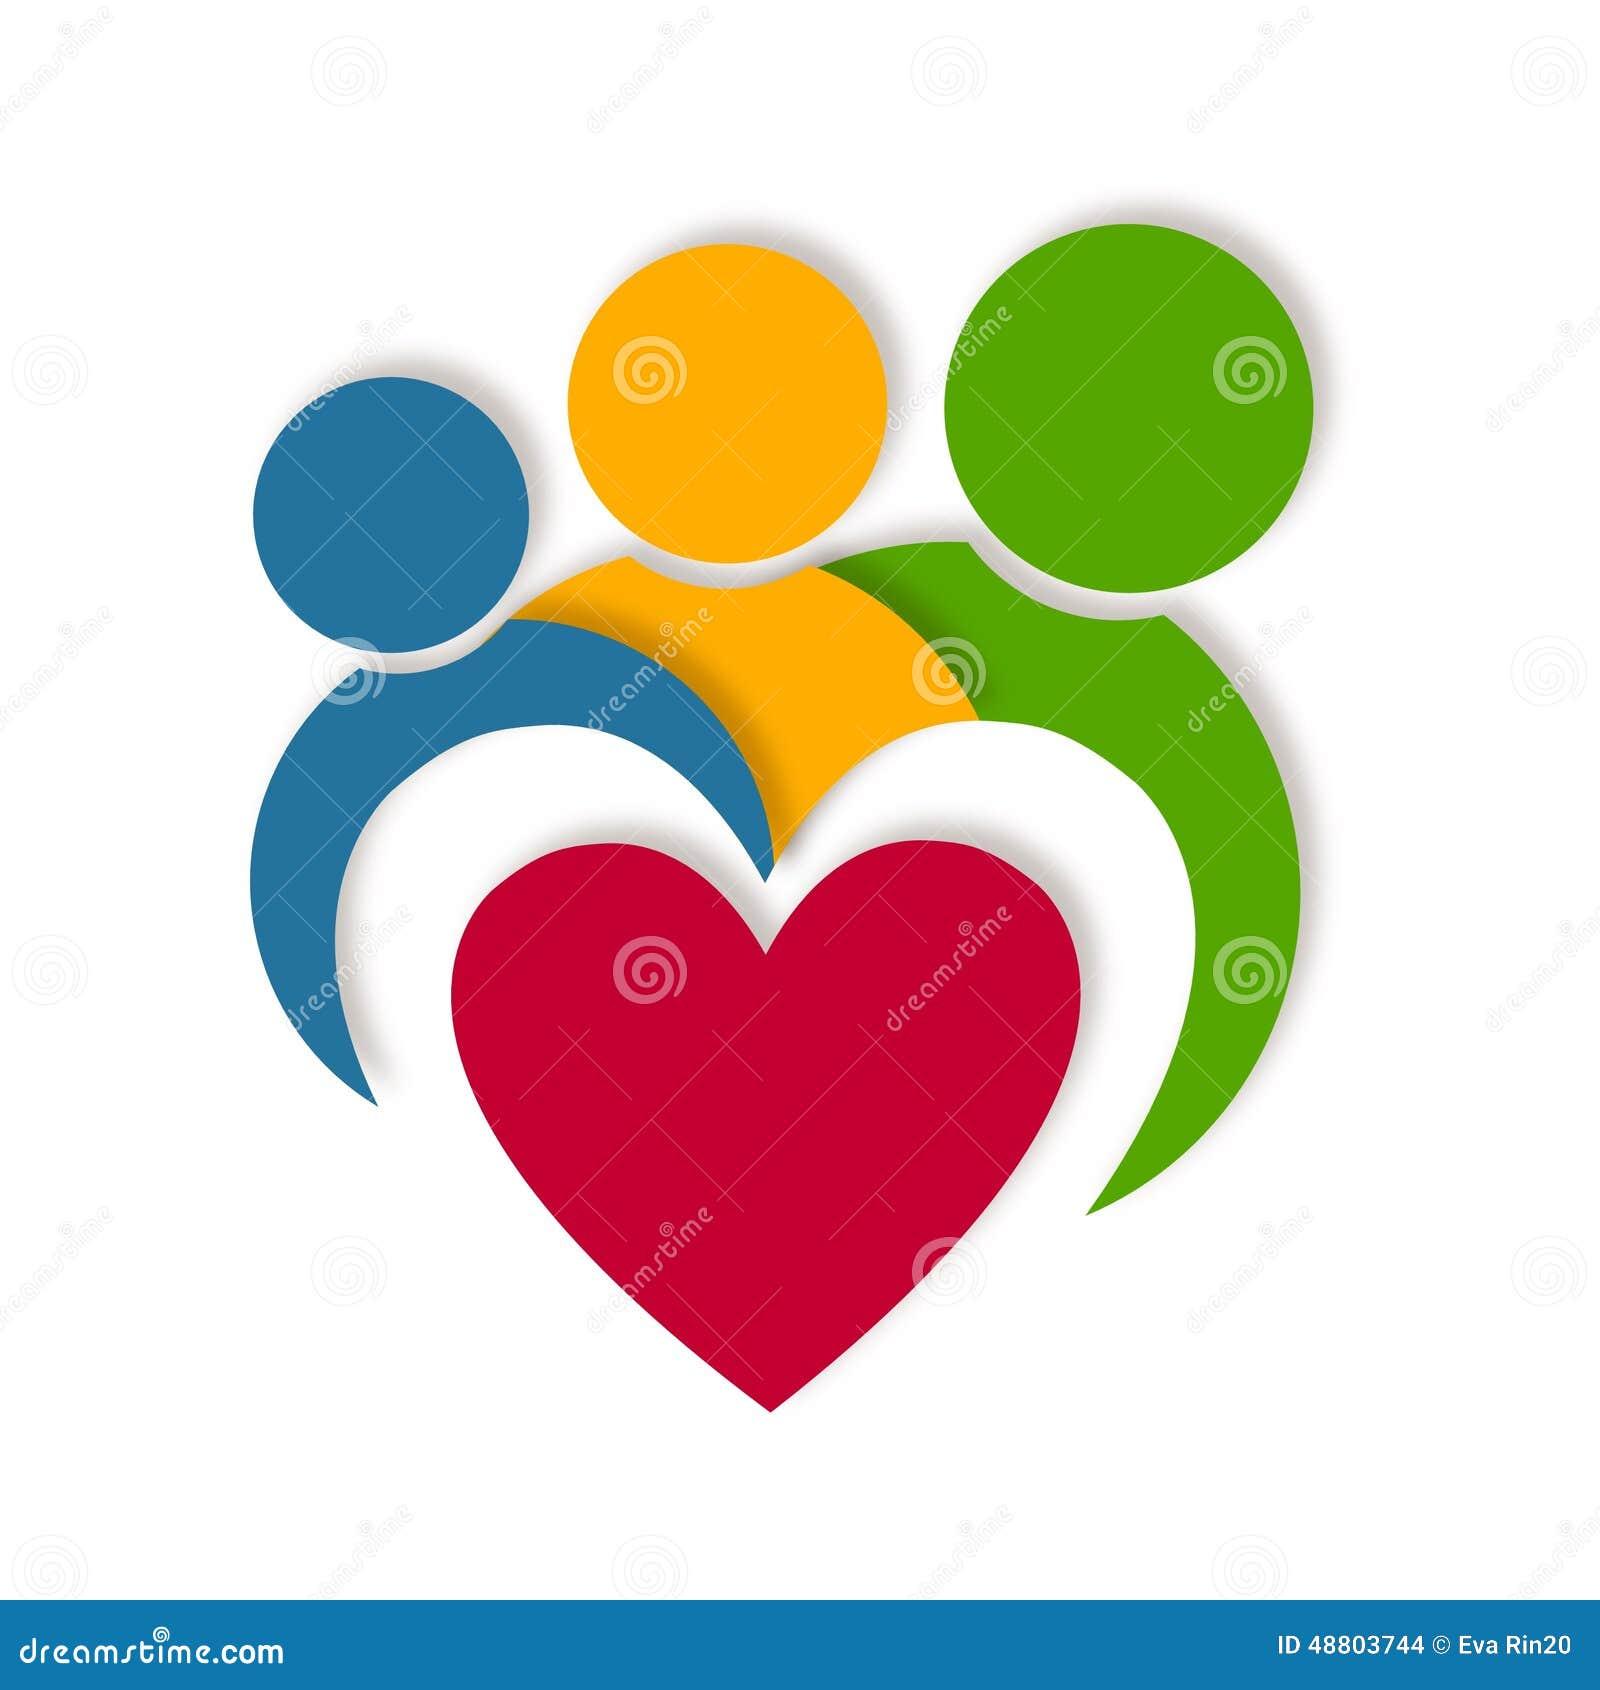 Abstract Health Life Logo Stock Illustration - Image: 48803744